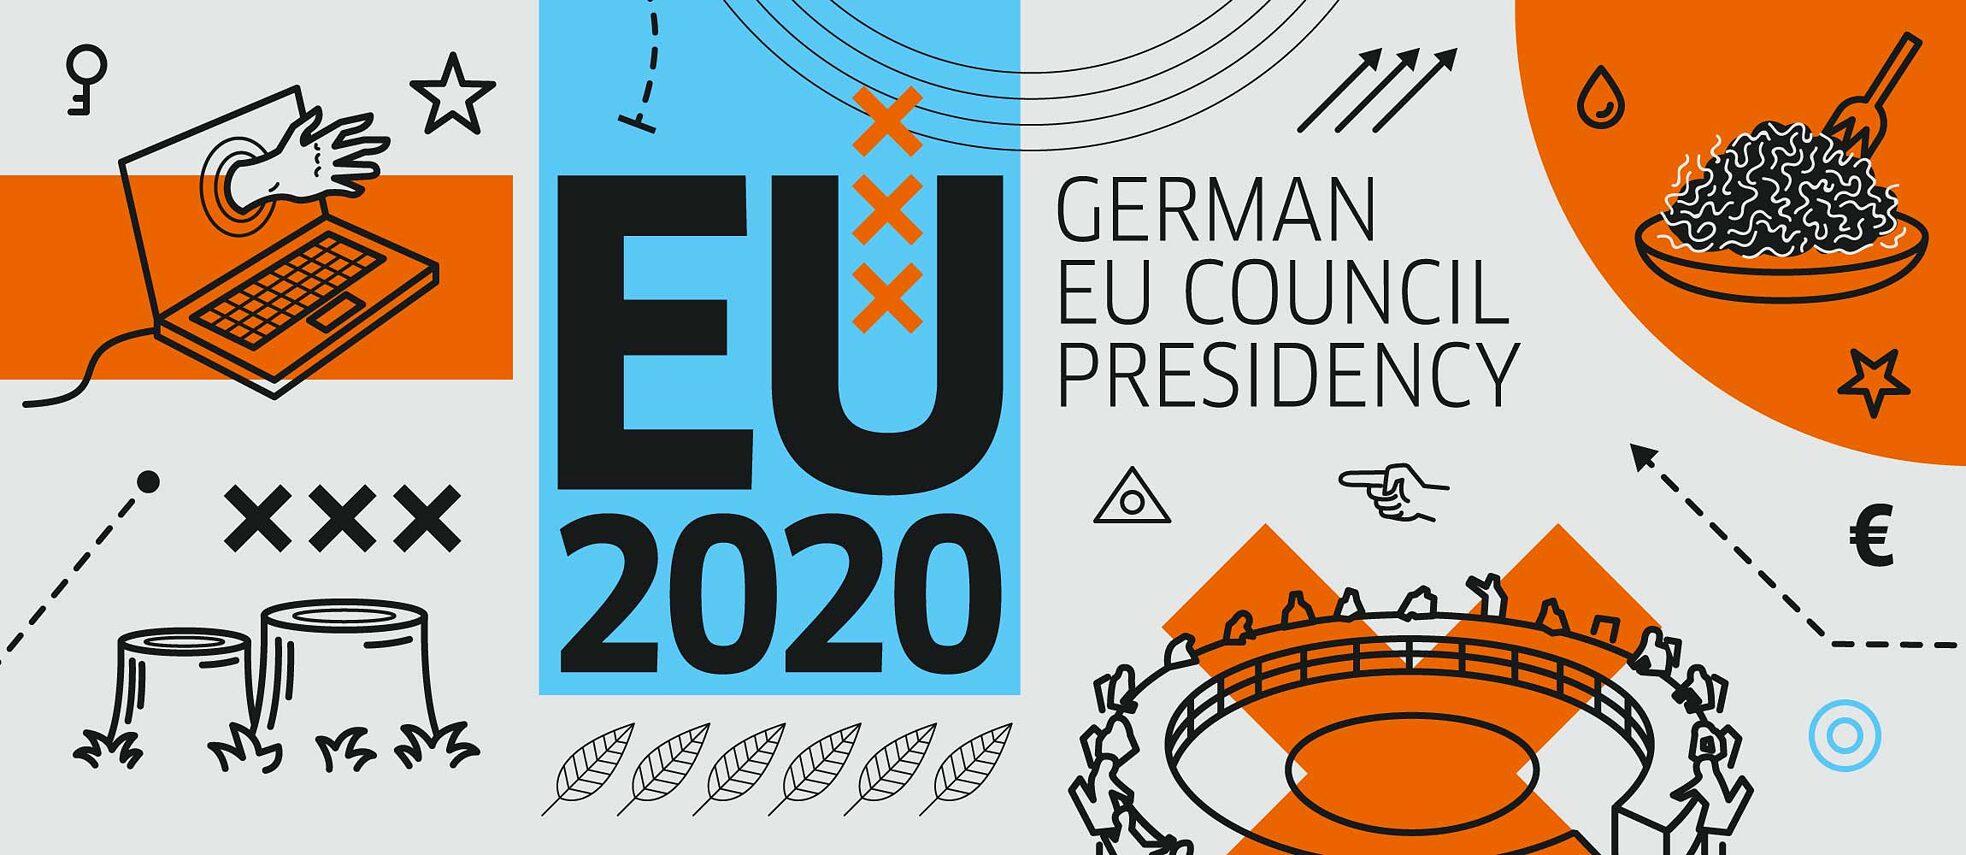 german-eu-council-presidency